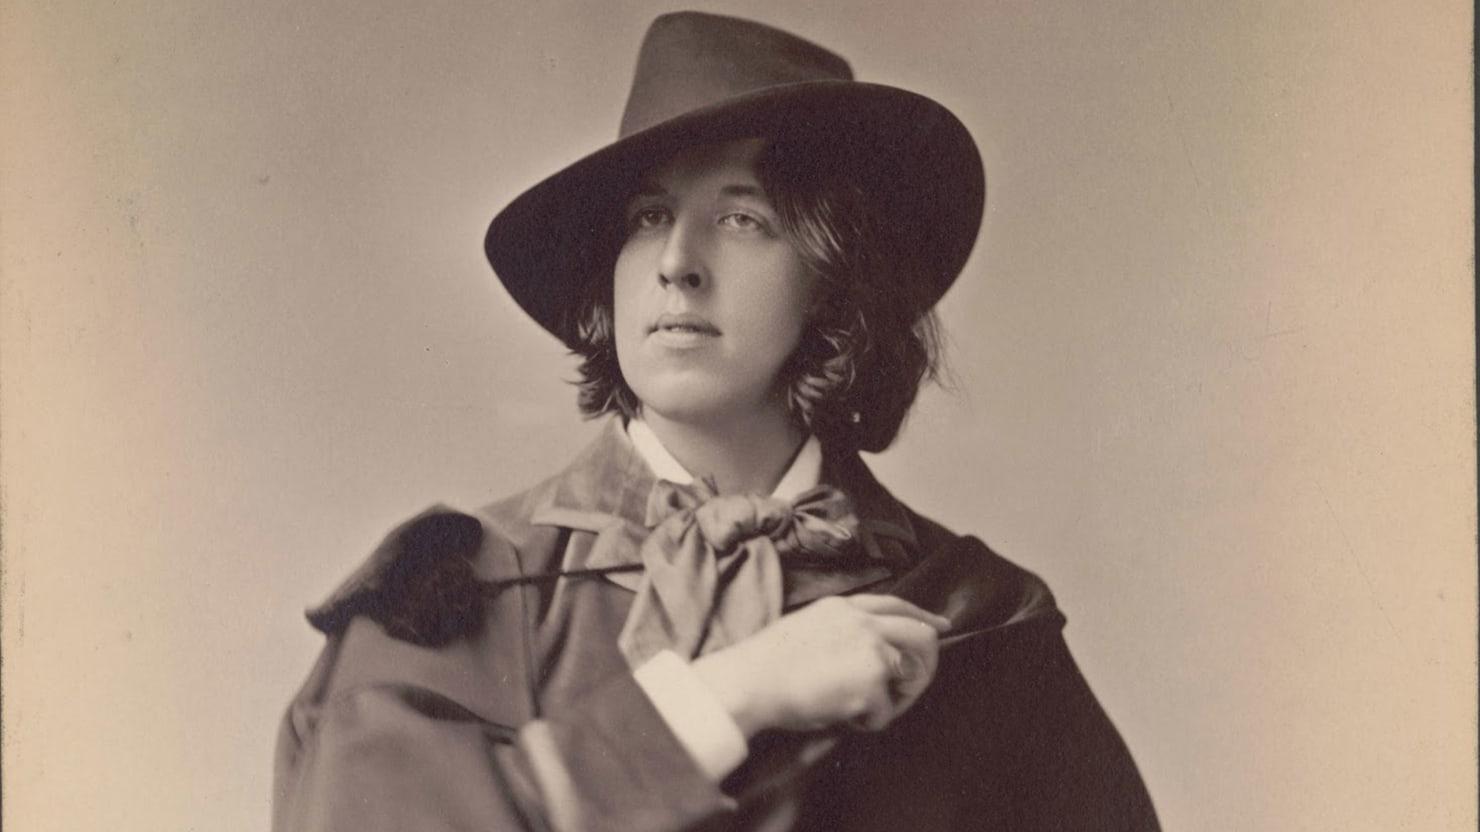 The Paris Exhibit Celebrating The Scandalous Brilliance of Oscar Wilde